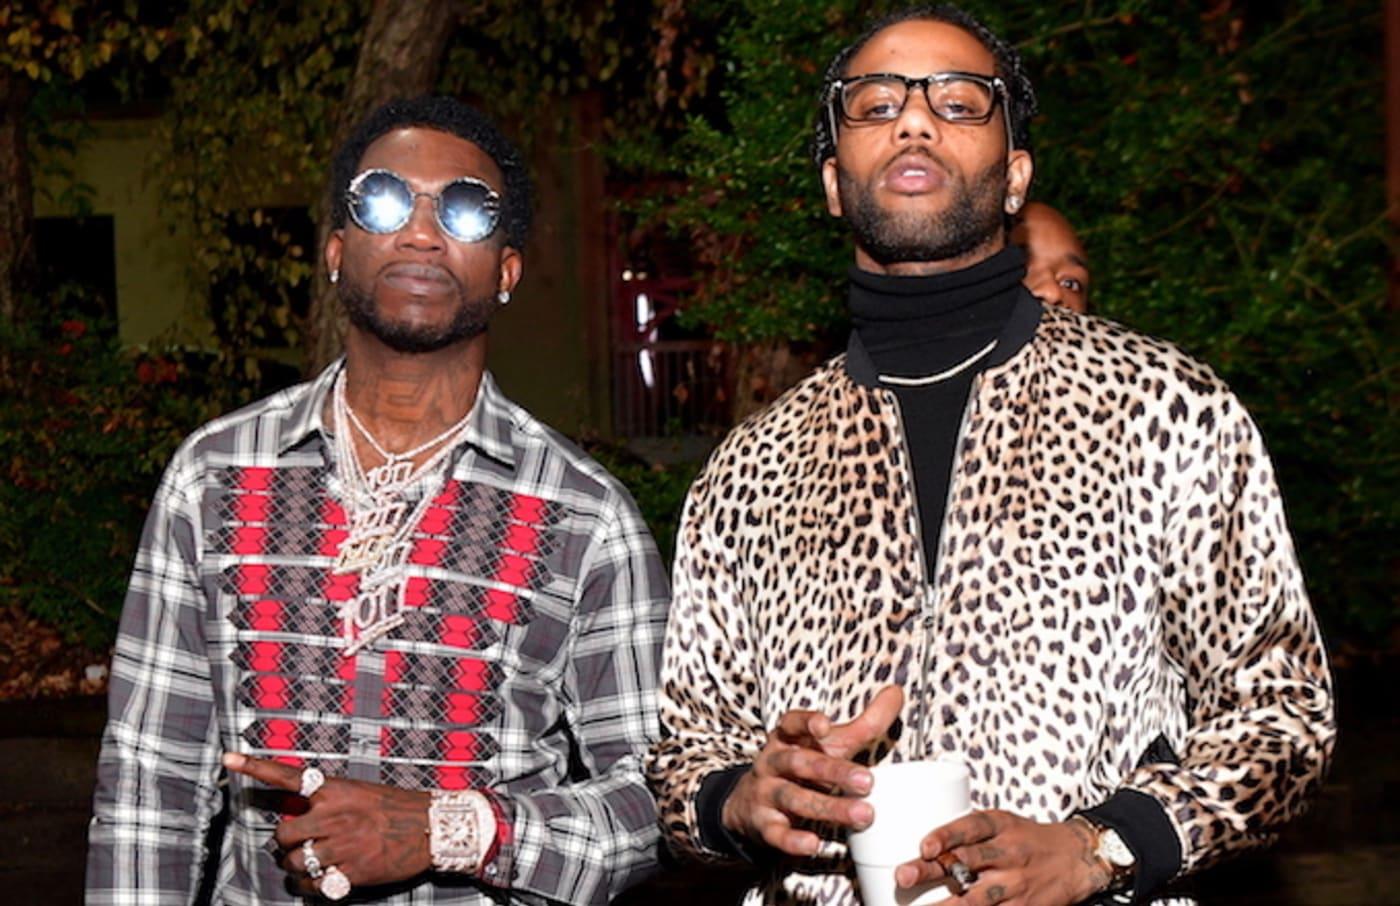 Gucci Mane and Hoodrich Pablo Juan